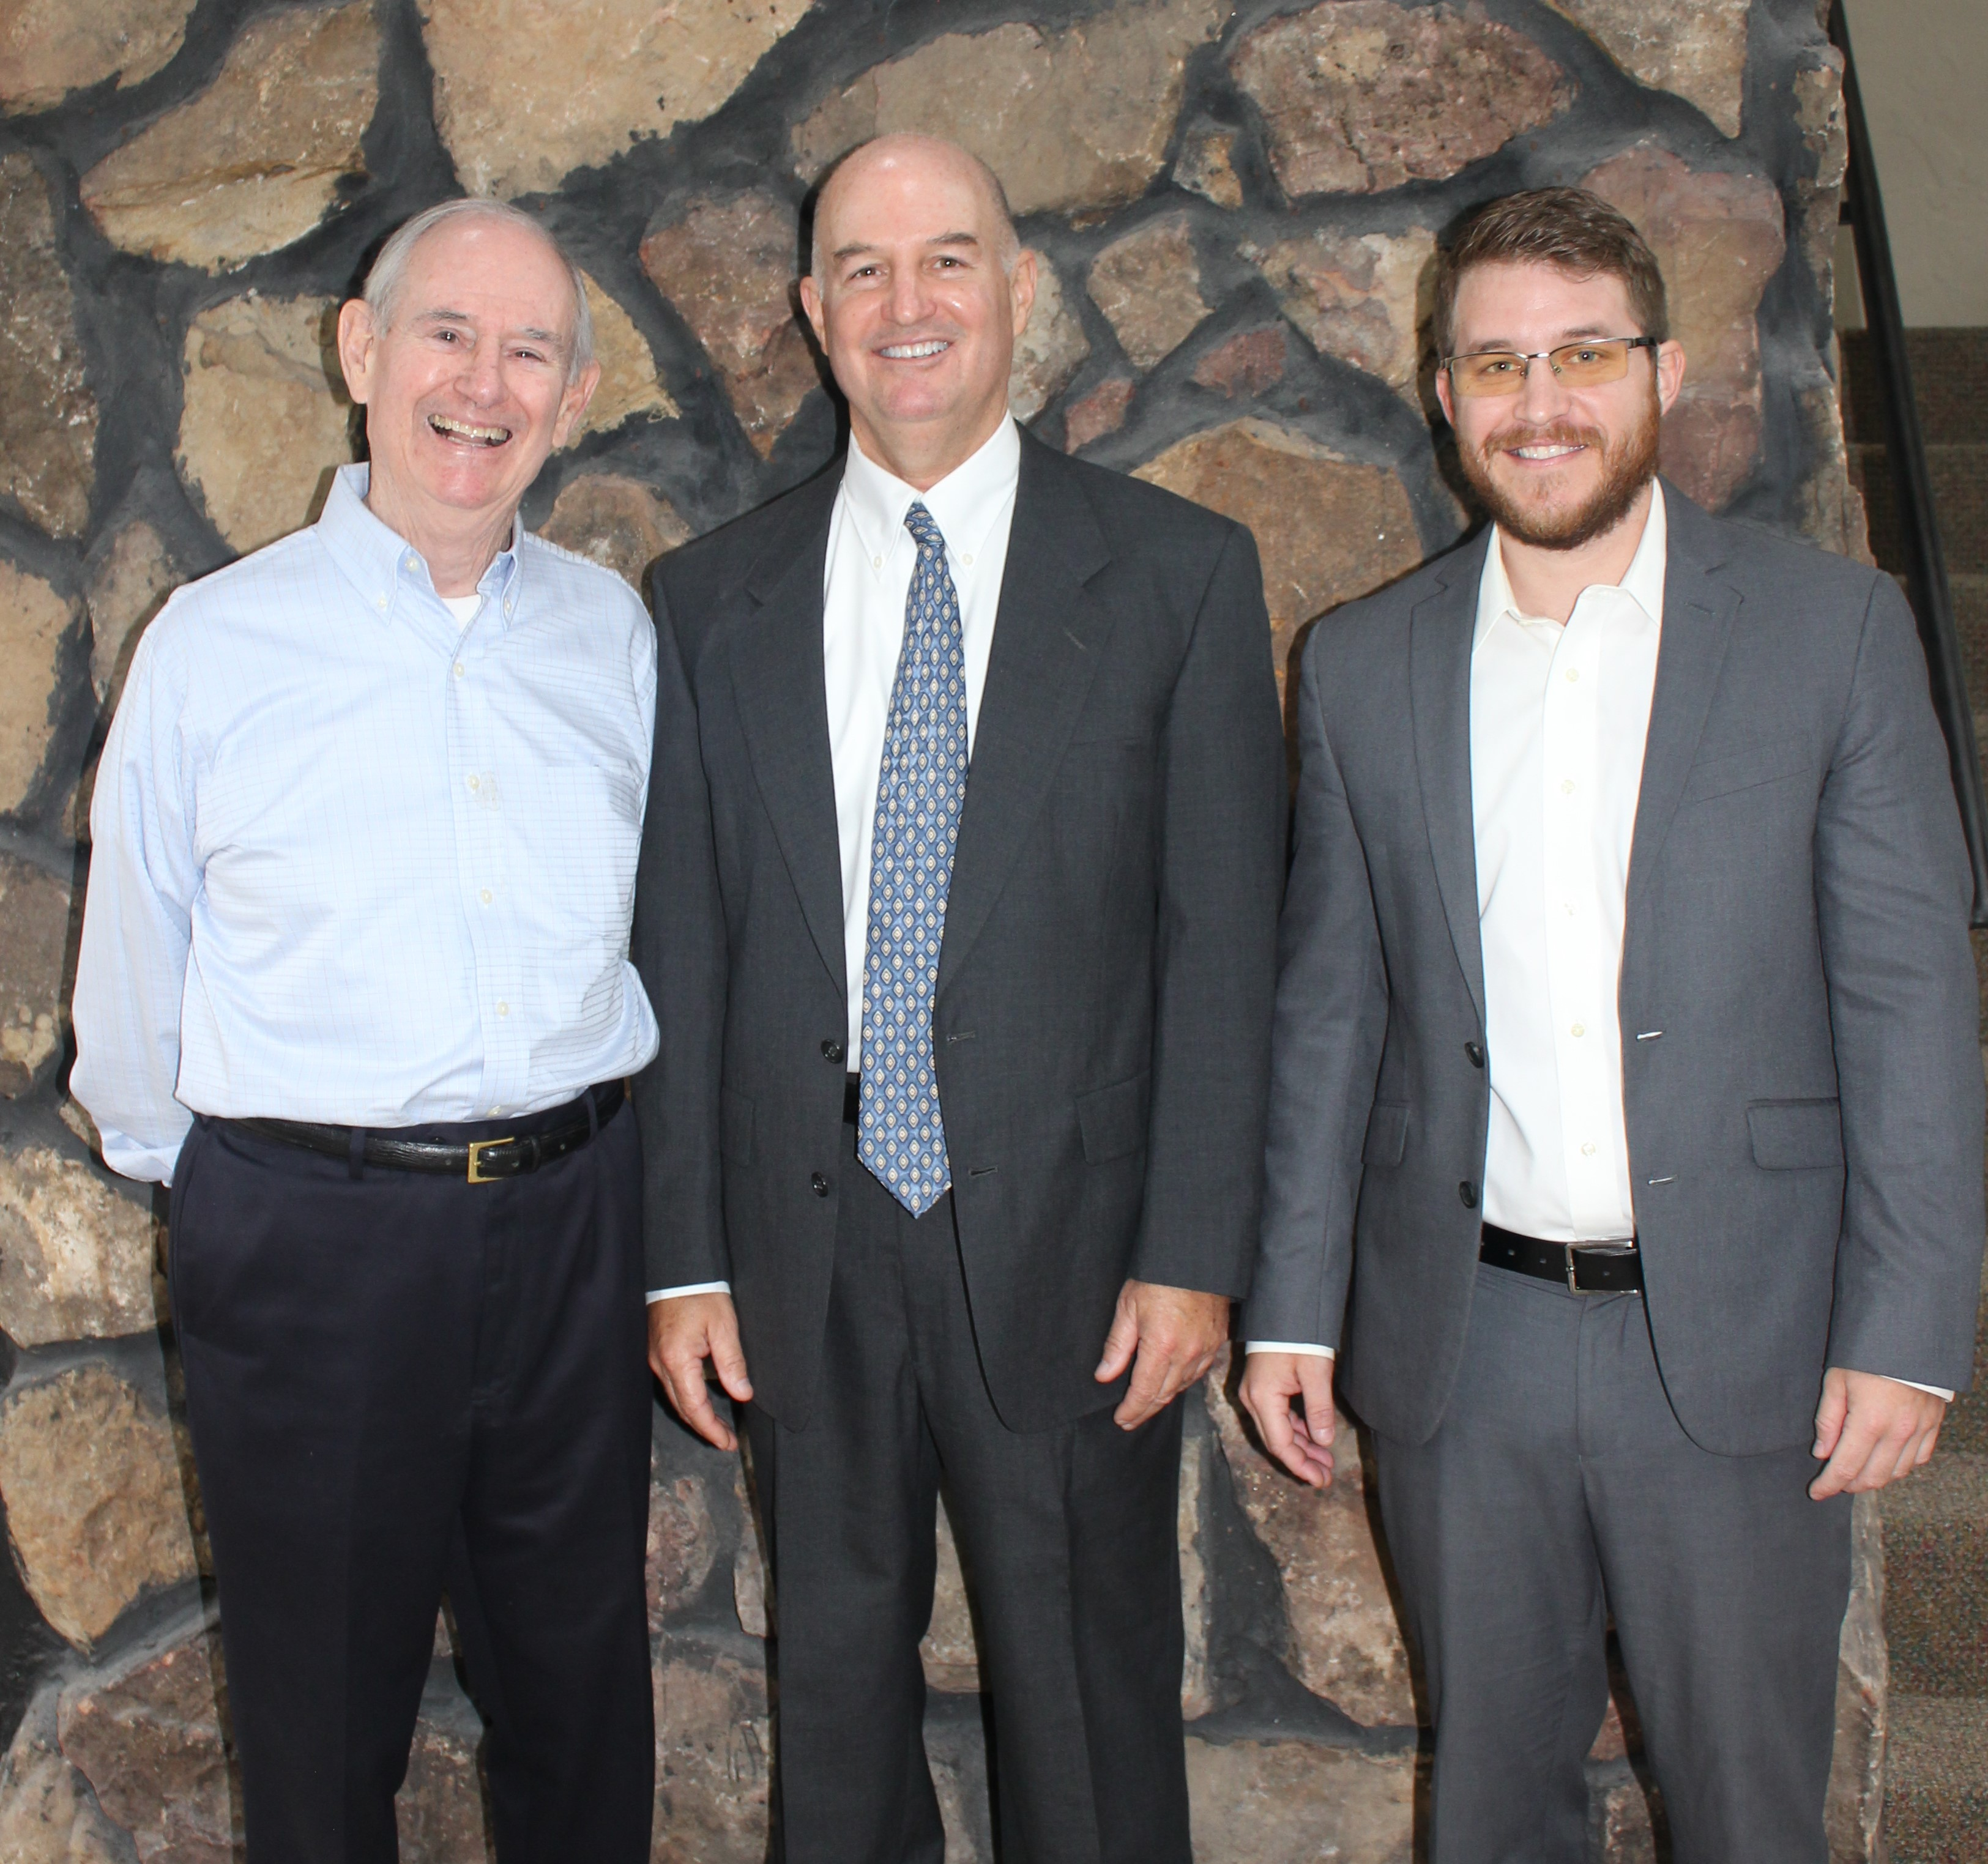 Cyrus Harris, Whit Harris, and Garrett Harris